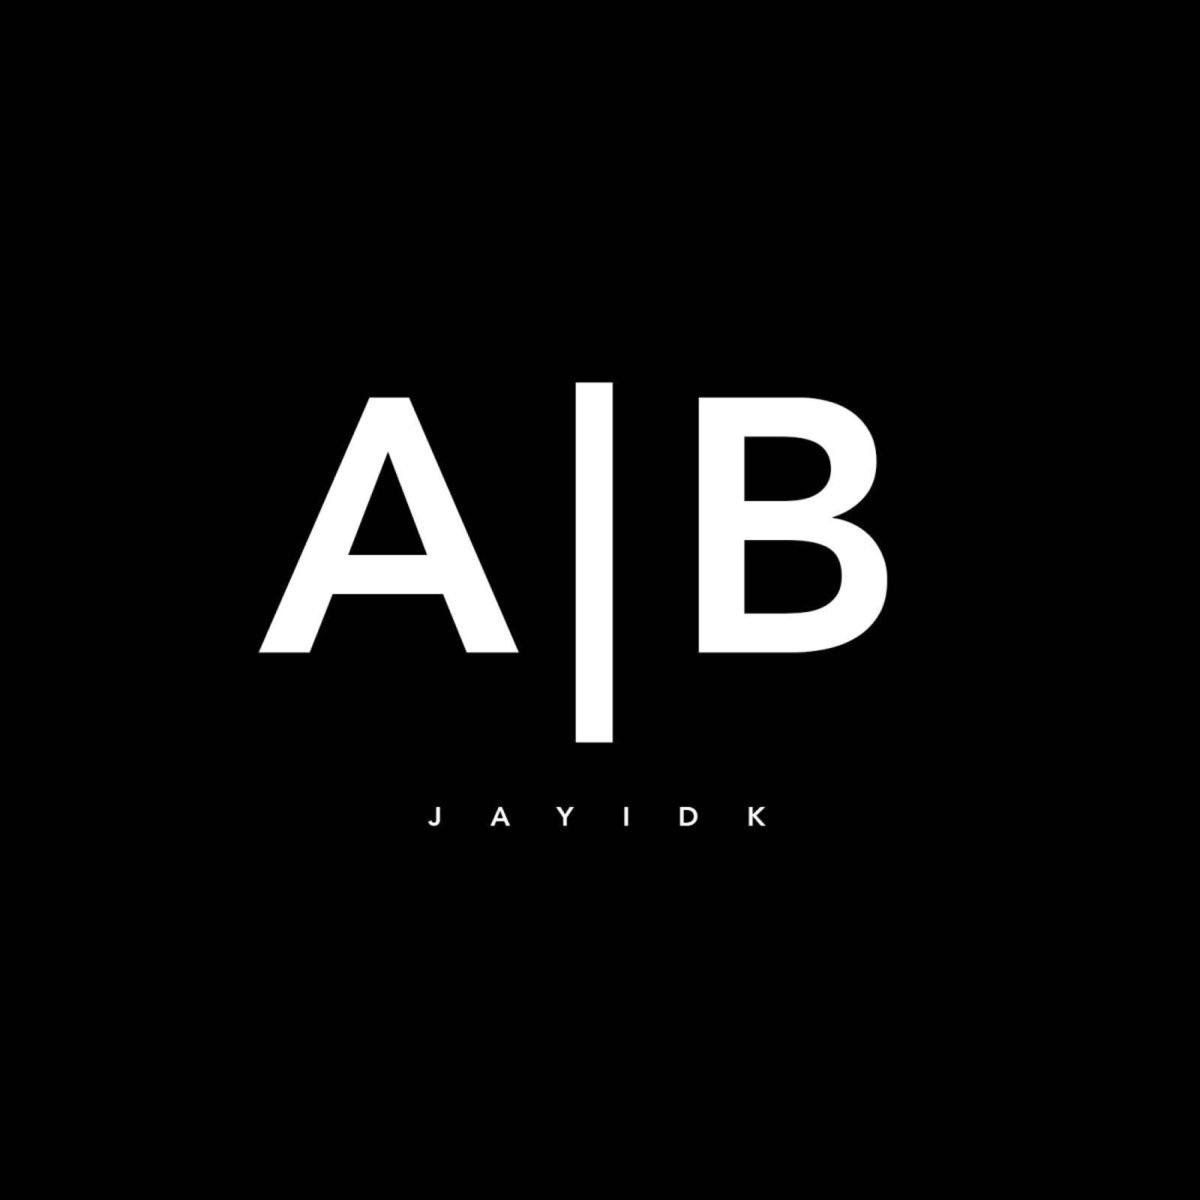 AB Singles - Single IDK CD cover